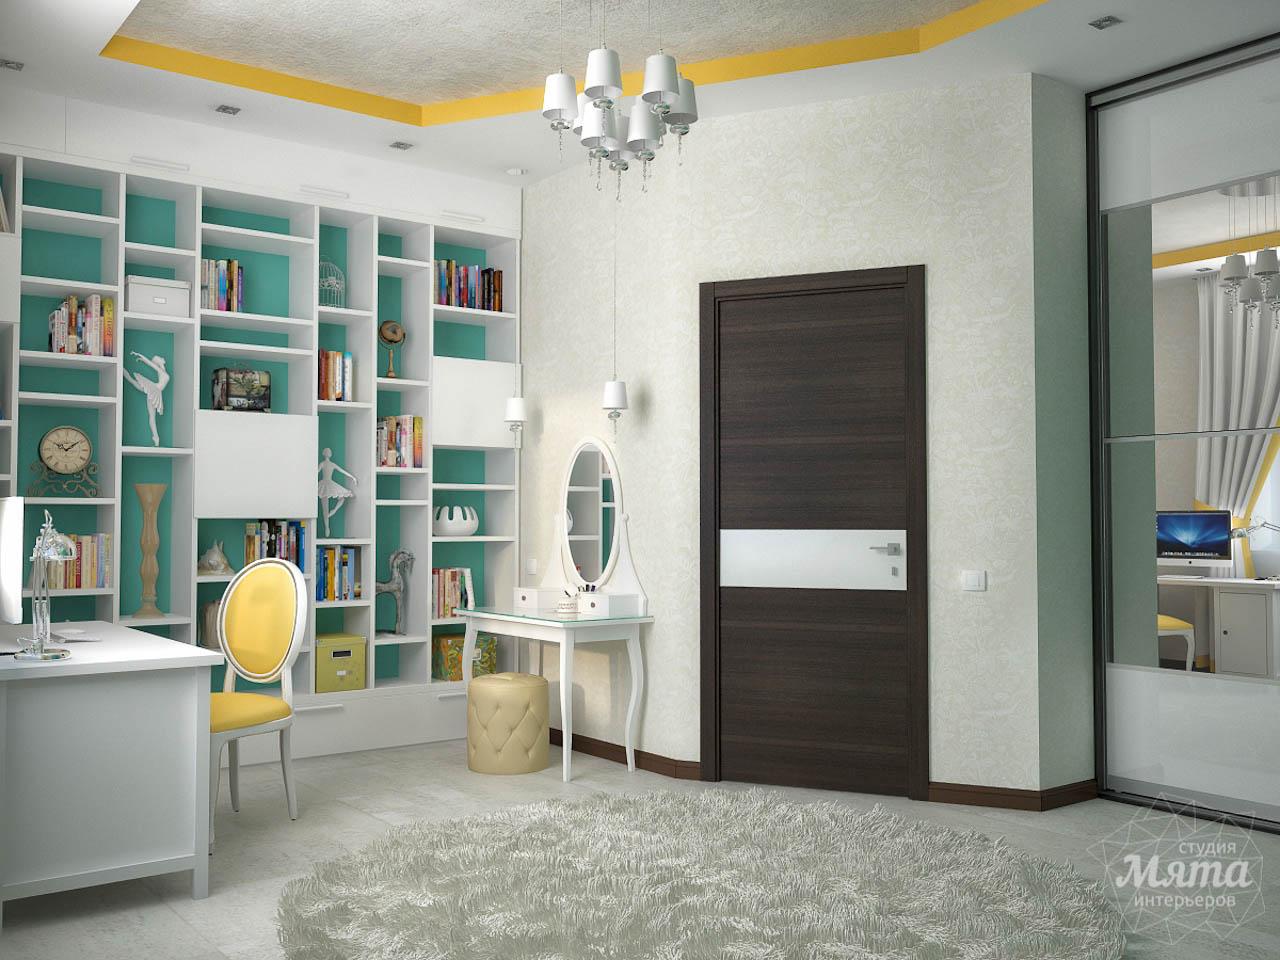 Дизайн проект интерьера коттеджа  в стиле минимализм по ул. Барвинка 15 img577384123